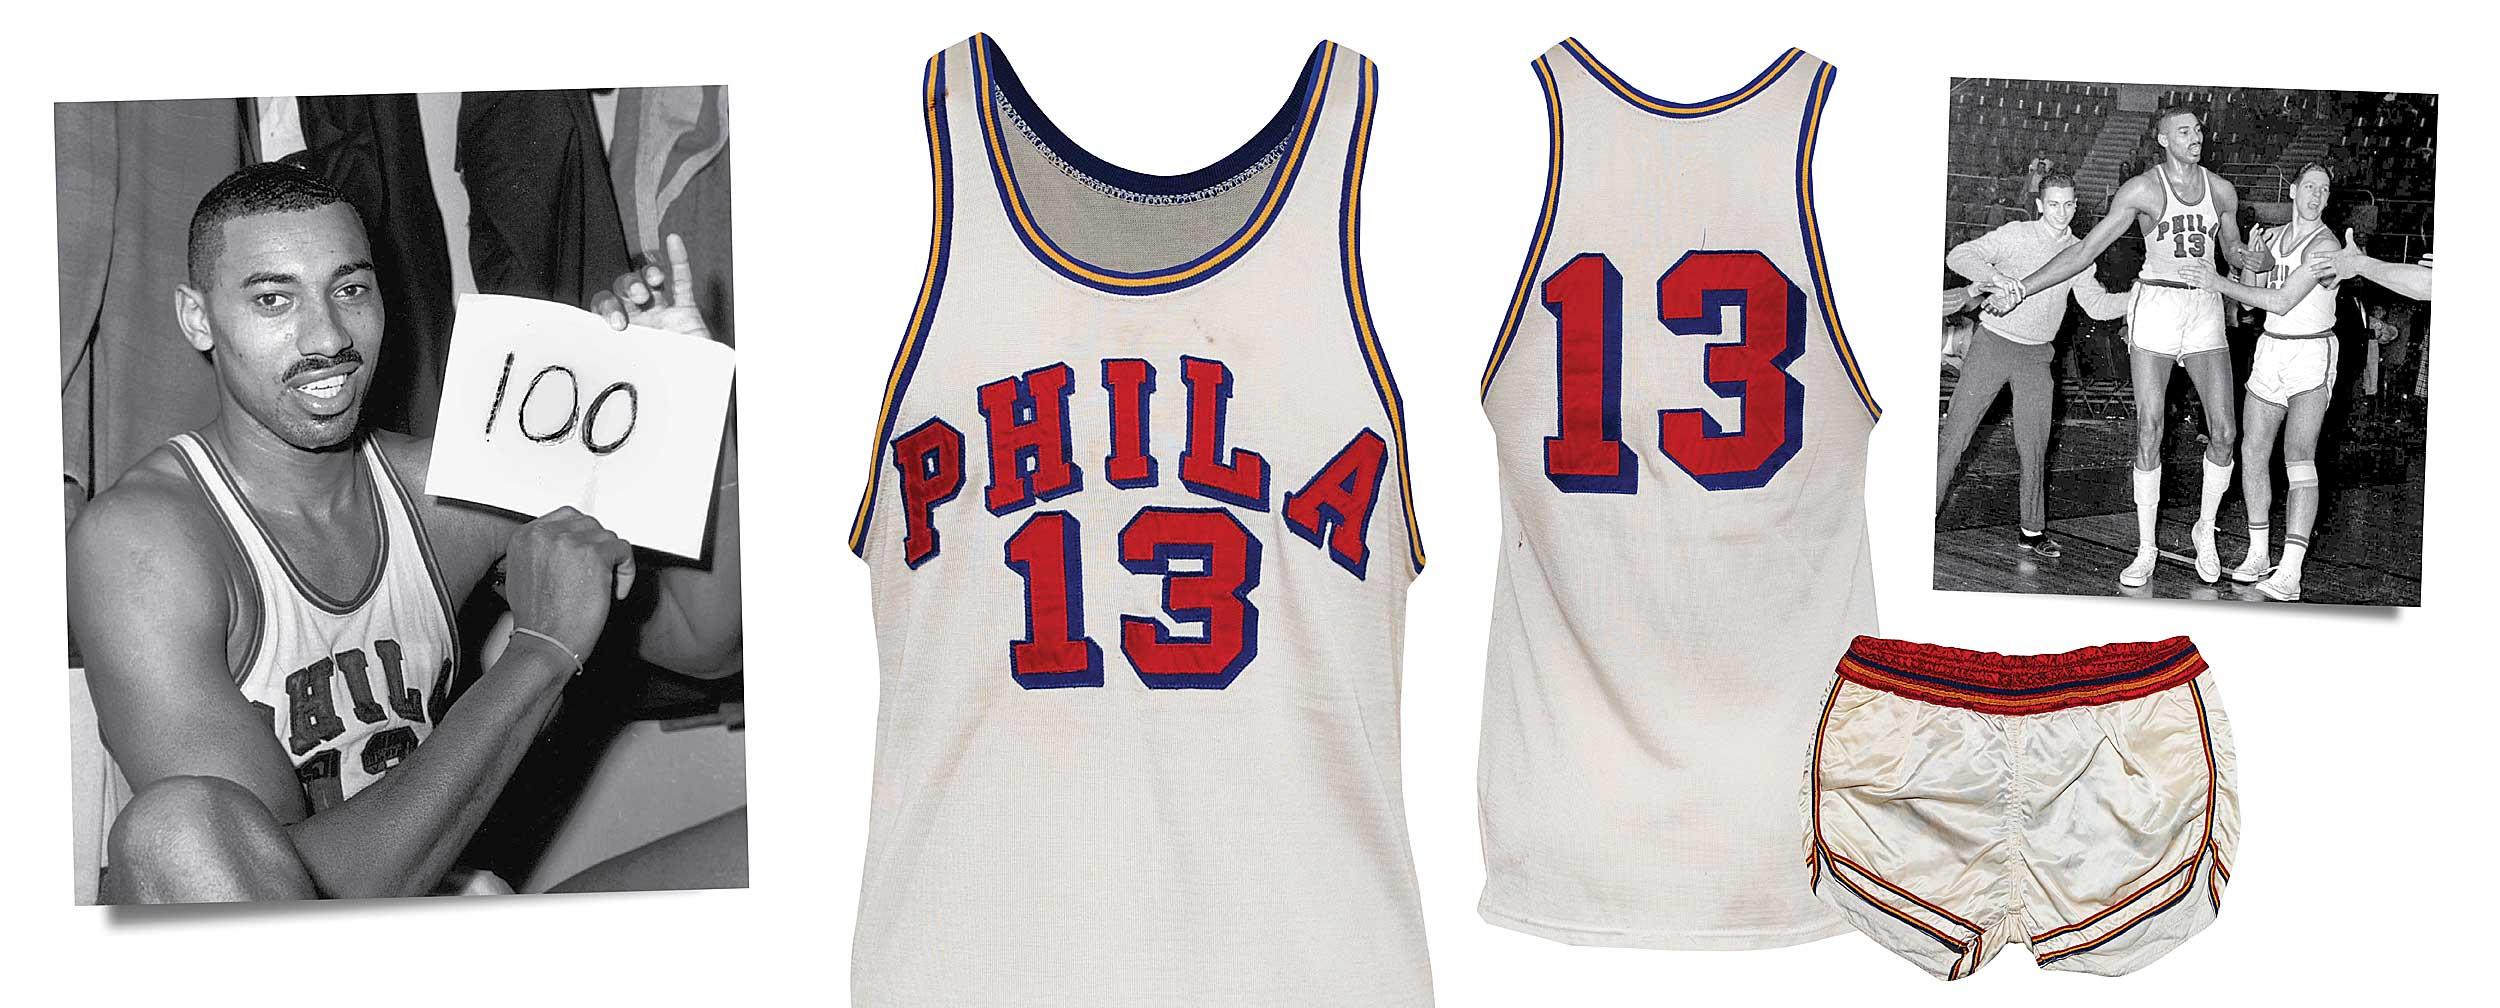 1960s Philadelphia Warriors Wilt Chamberlain jersey